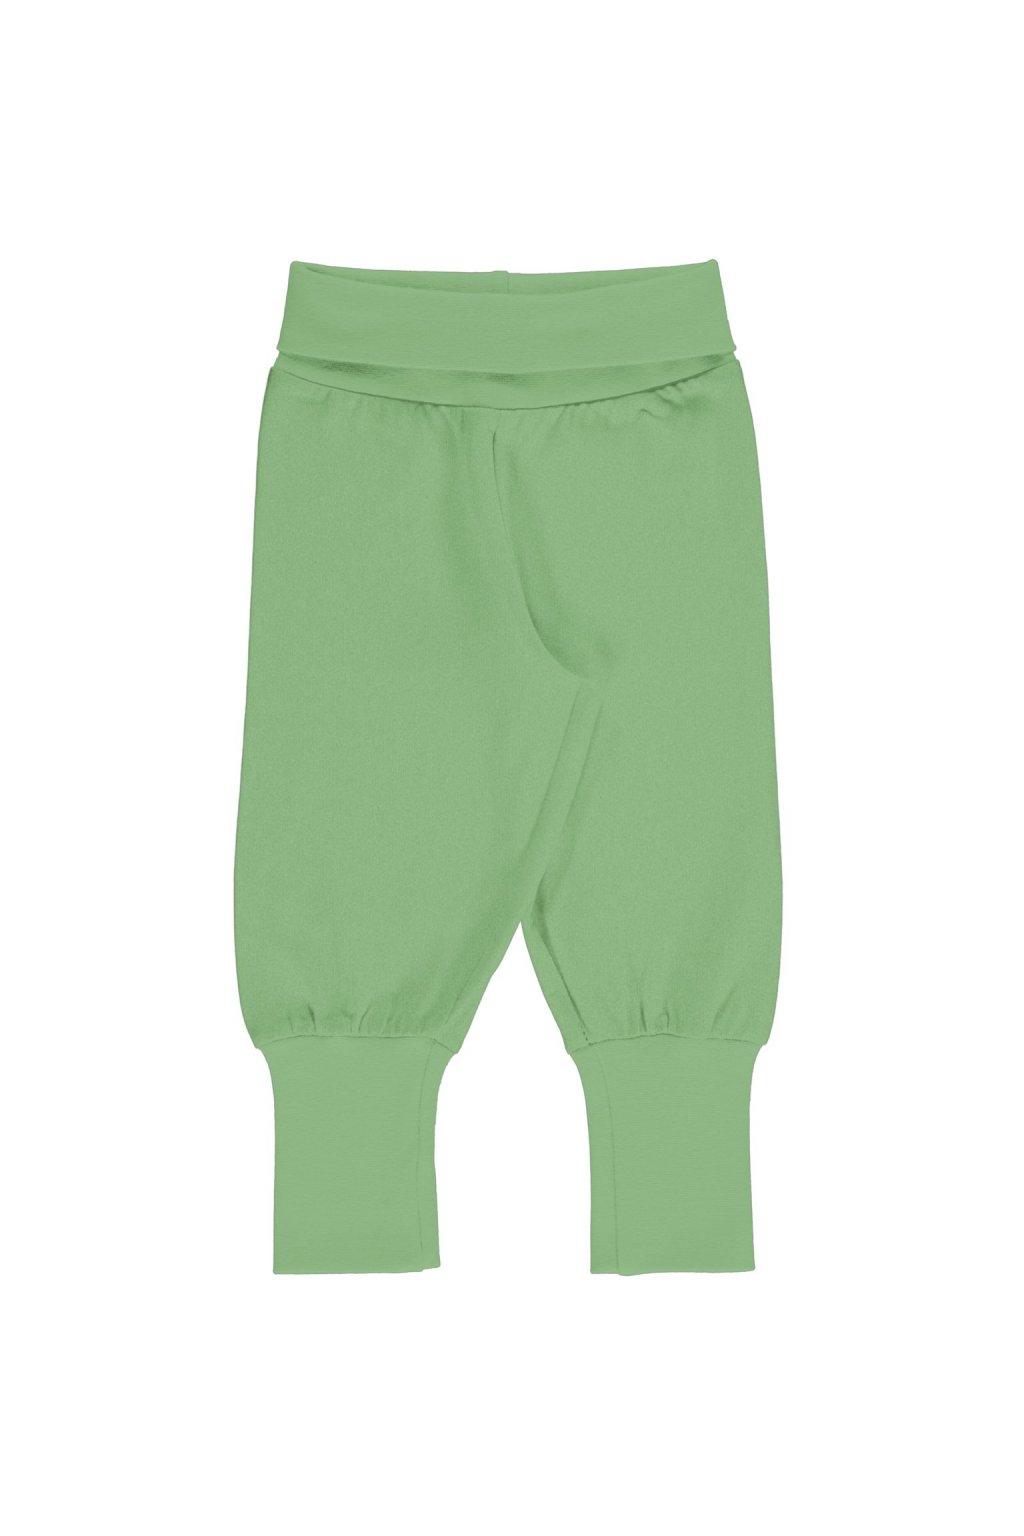 zelene biobavlnene kojenecke teplacky meyadey (2)